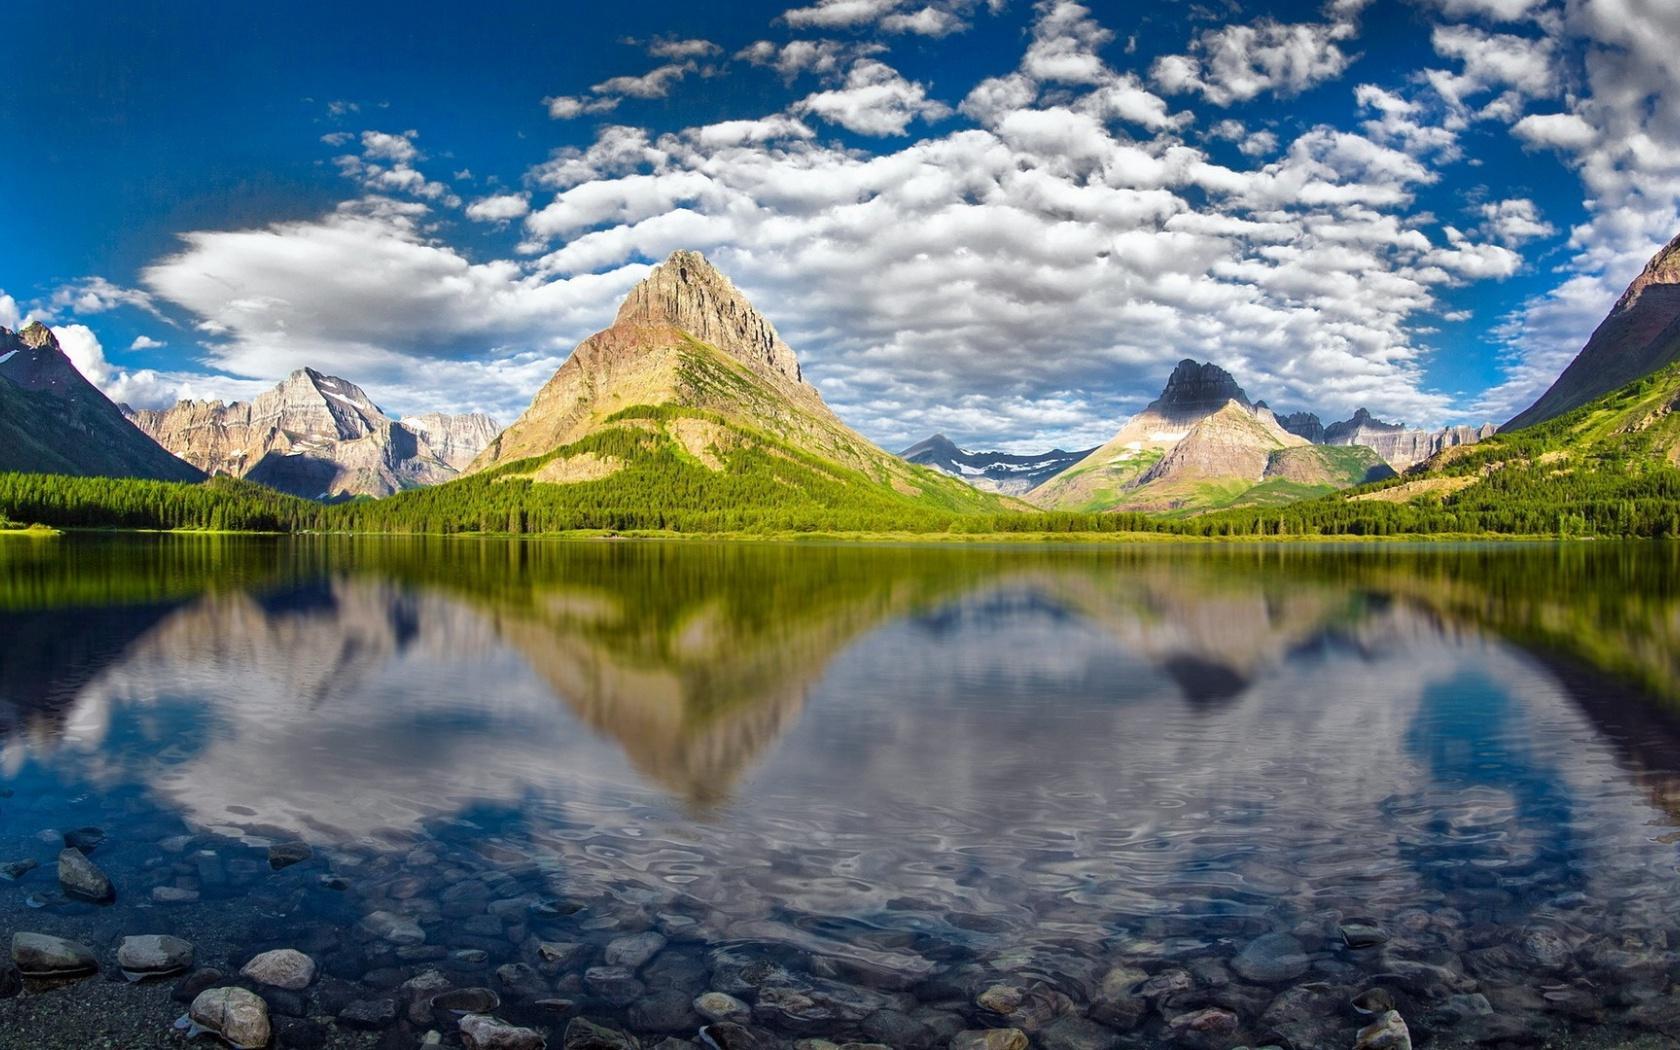 1680x1050 Beautiful Glacier National Park desktop PC and Mac wallpaper 1680x1050